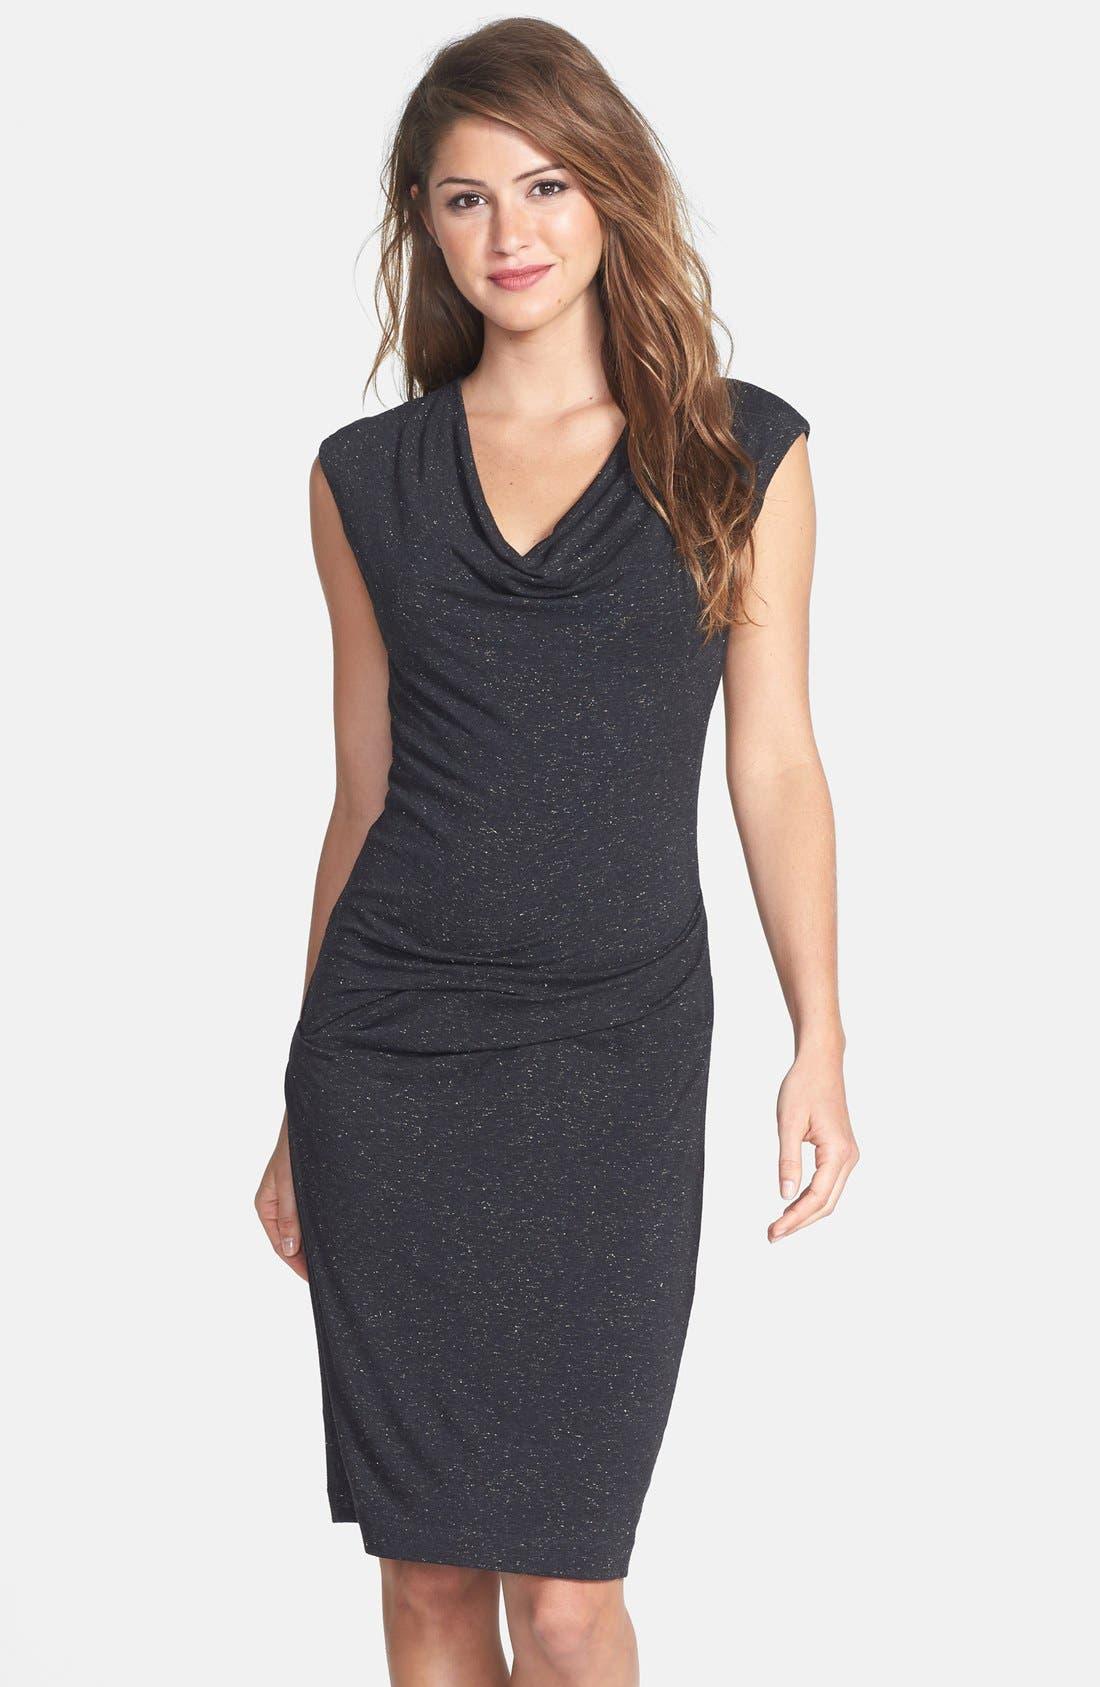 Main Image - Nicole Miller Speckled Metallic Jersey Dress